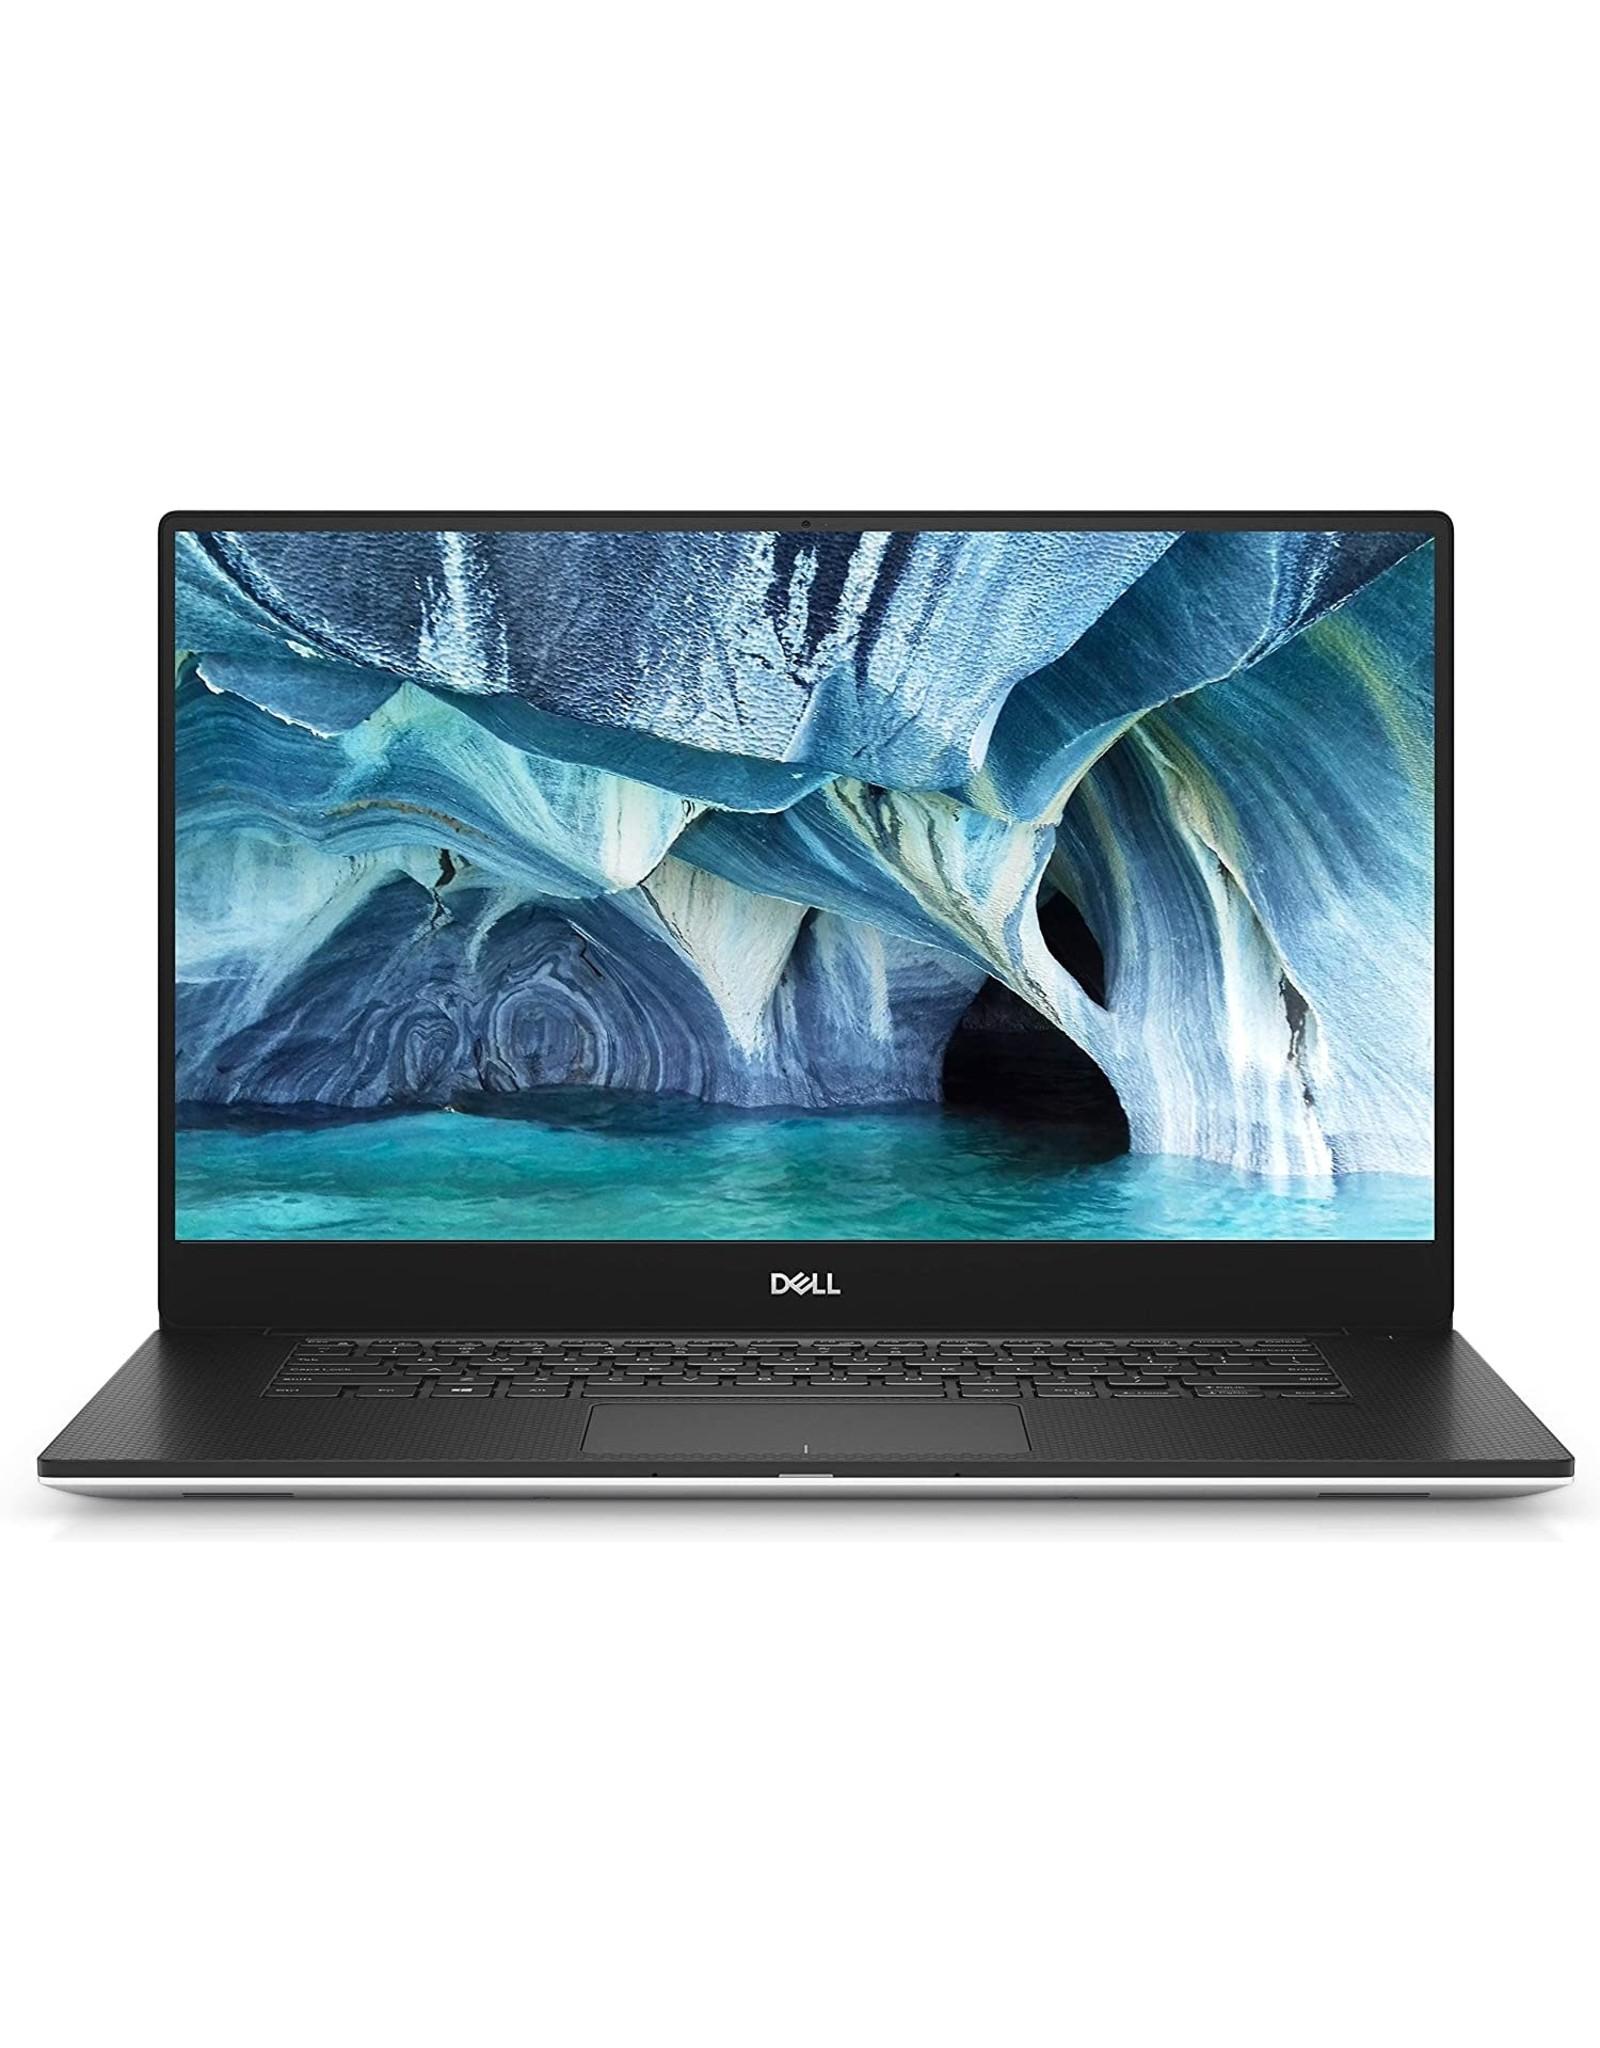 Dell (FSI) Dell XPS 15 (7590) 15.6 i7/32GB/1TB SSD w/ GTX 1050Ti 4GB GDDR5